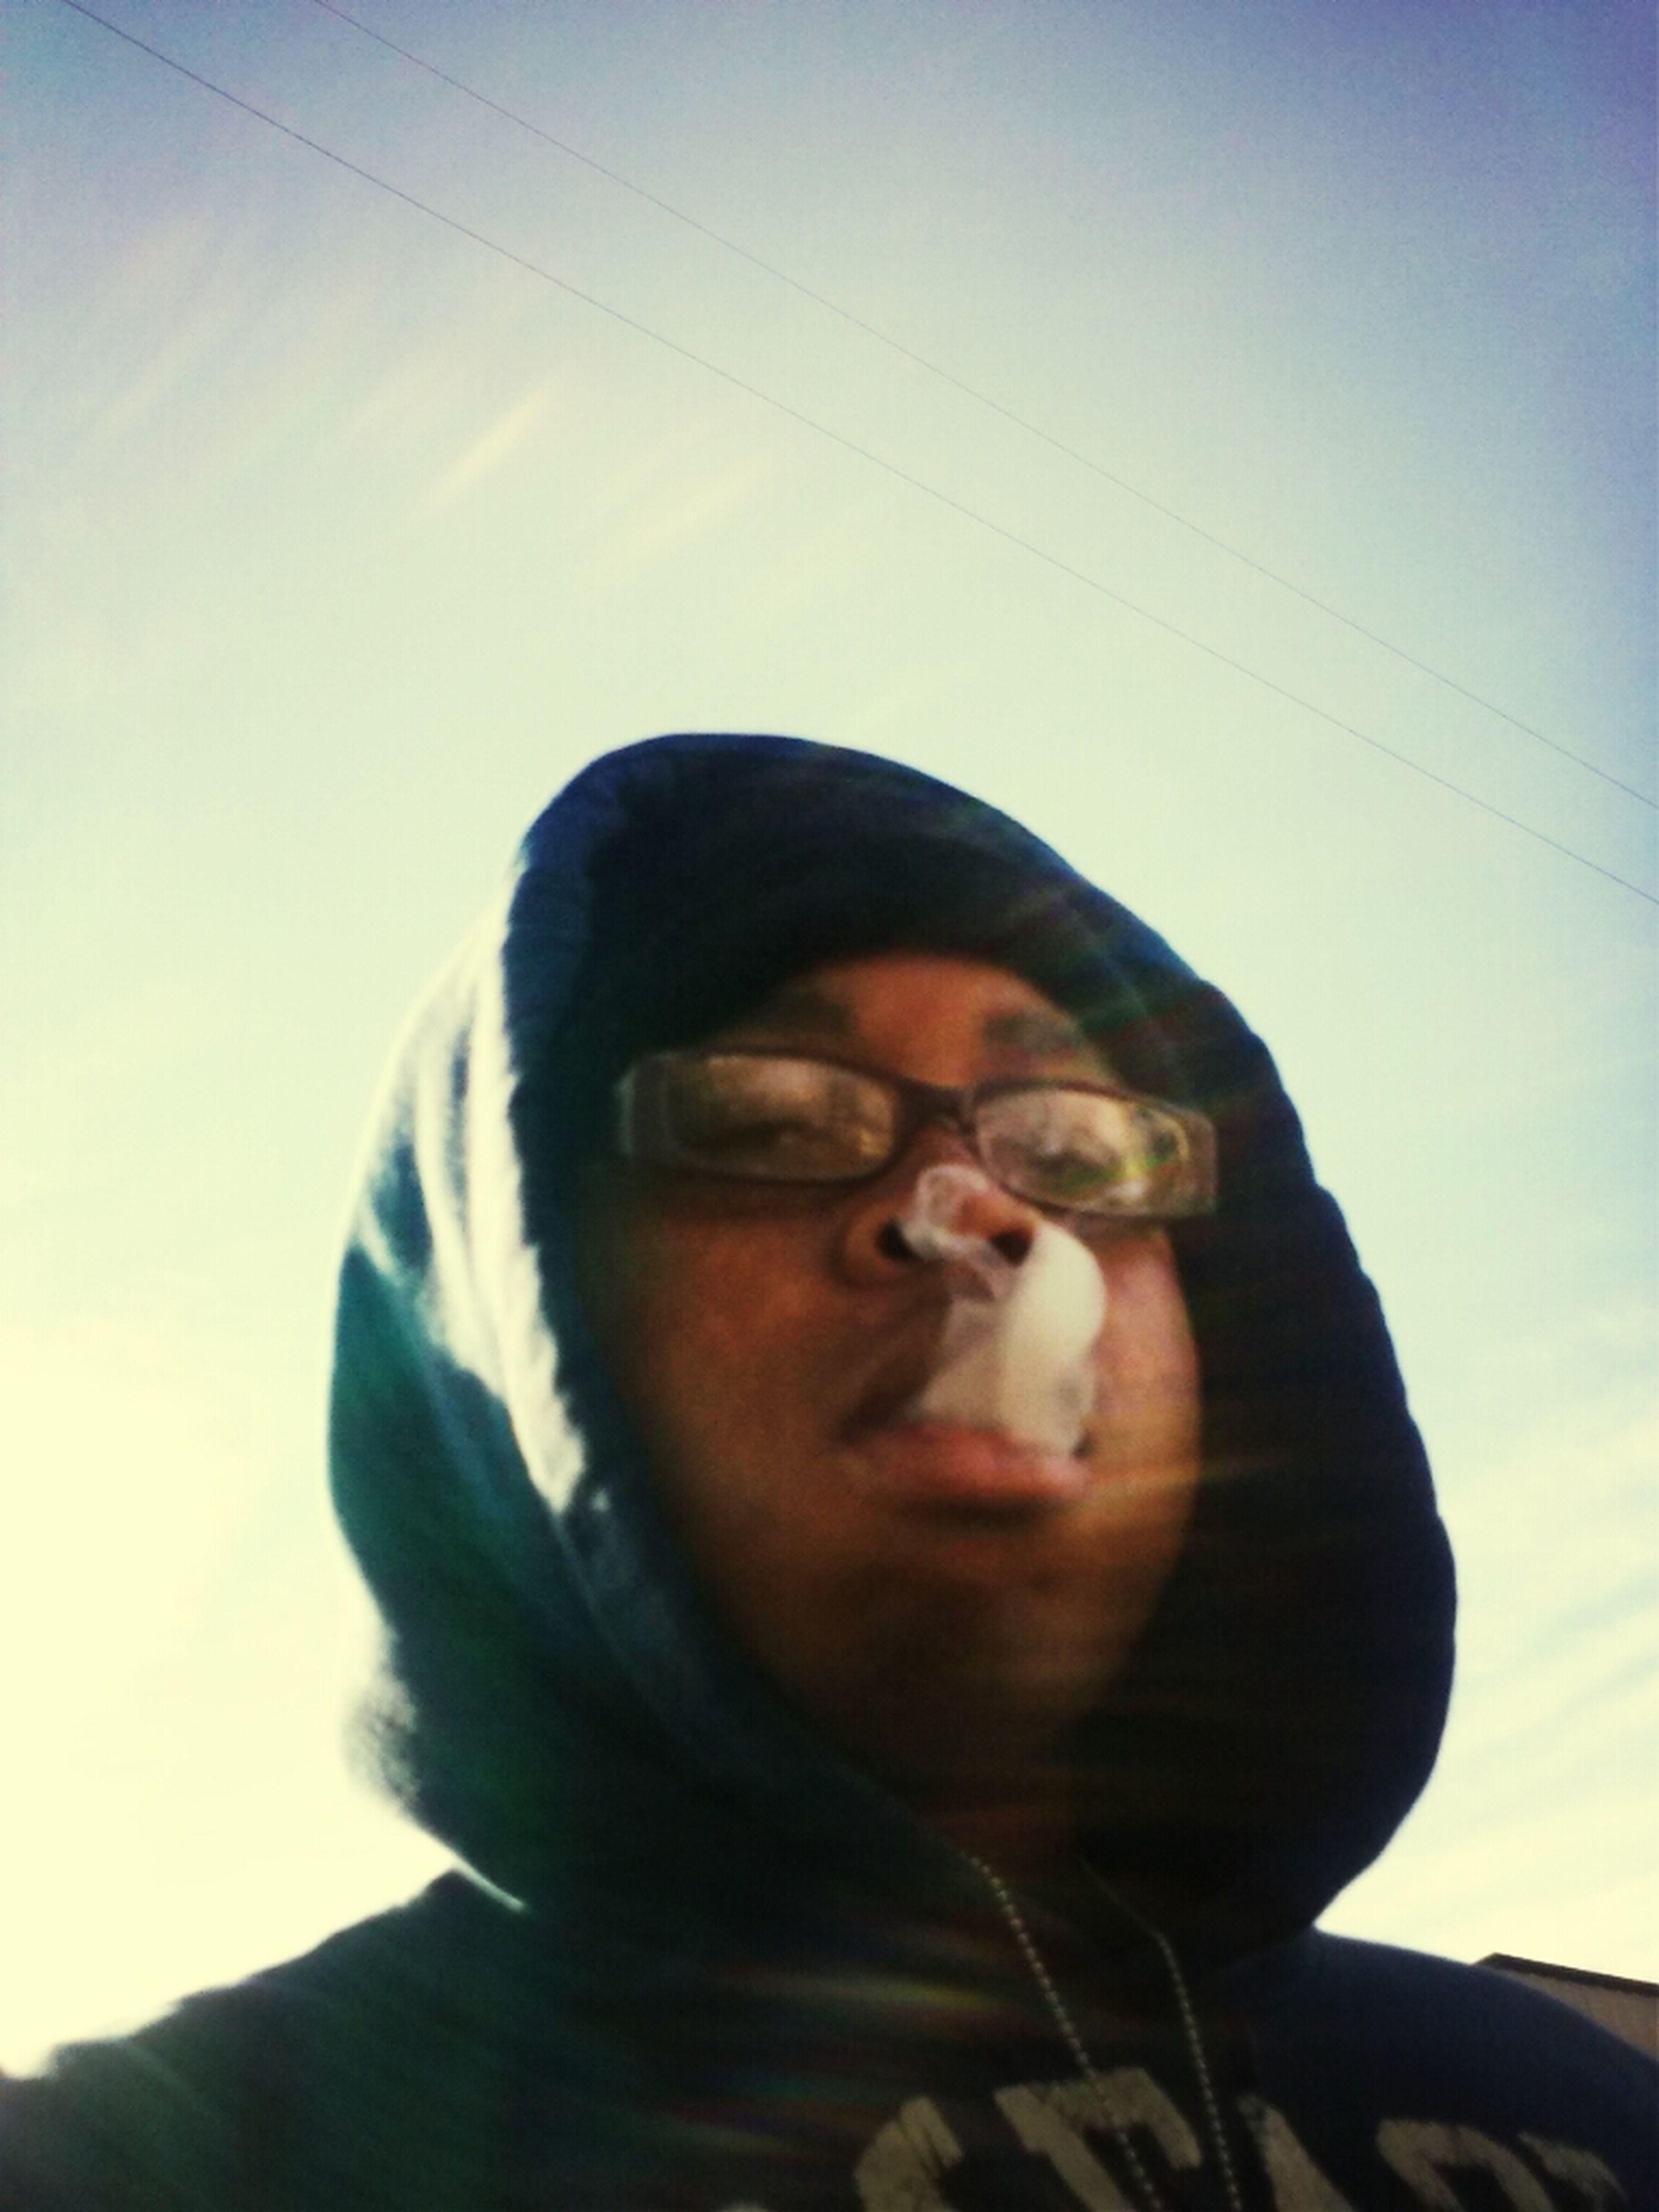 InHale Thr Cush Then I BlowOut